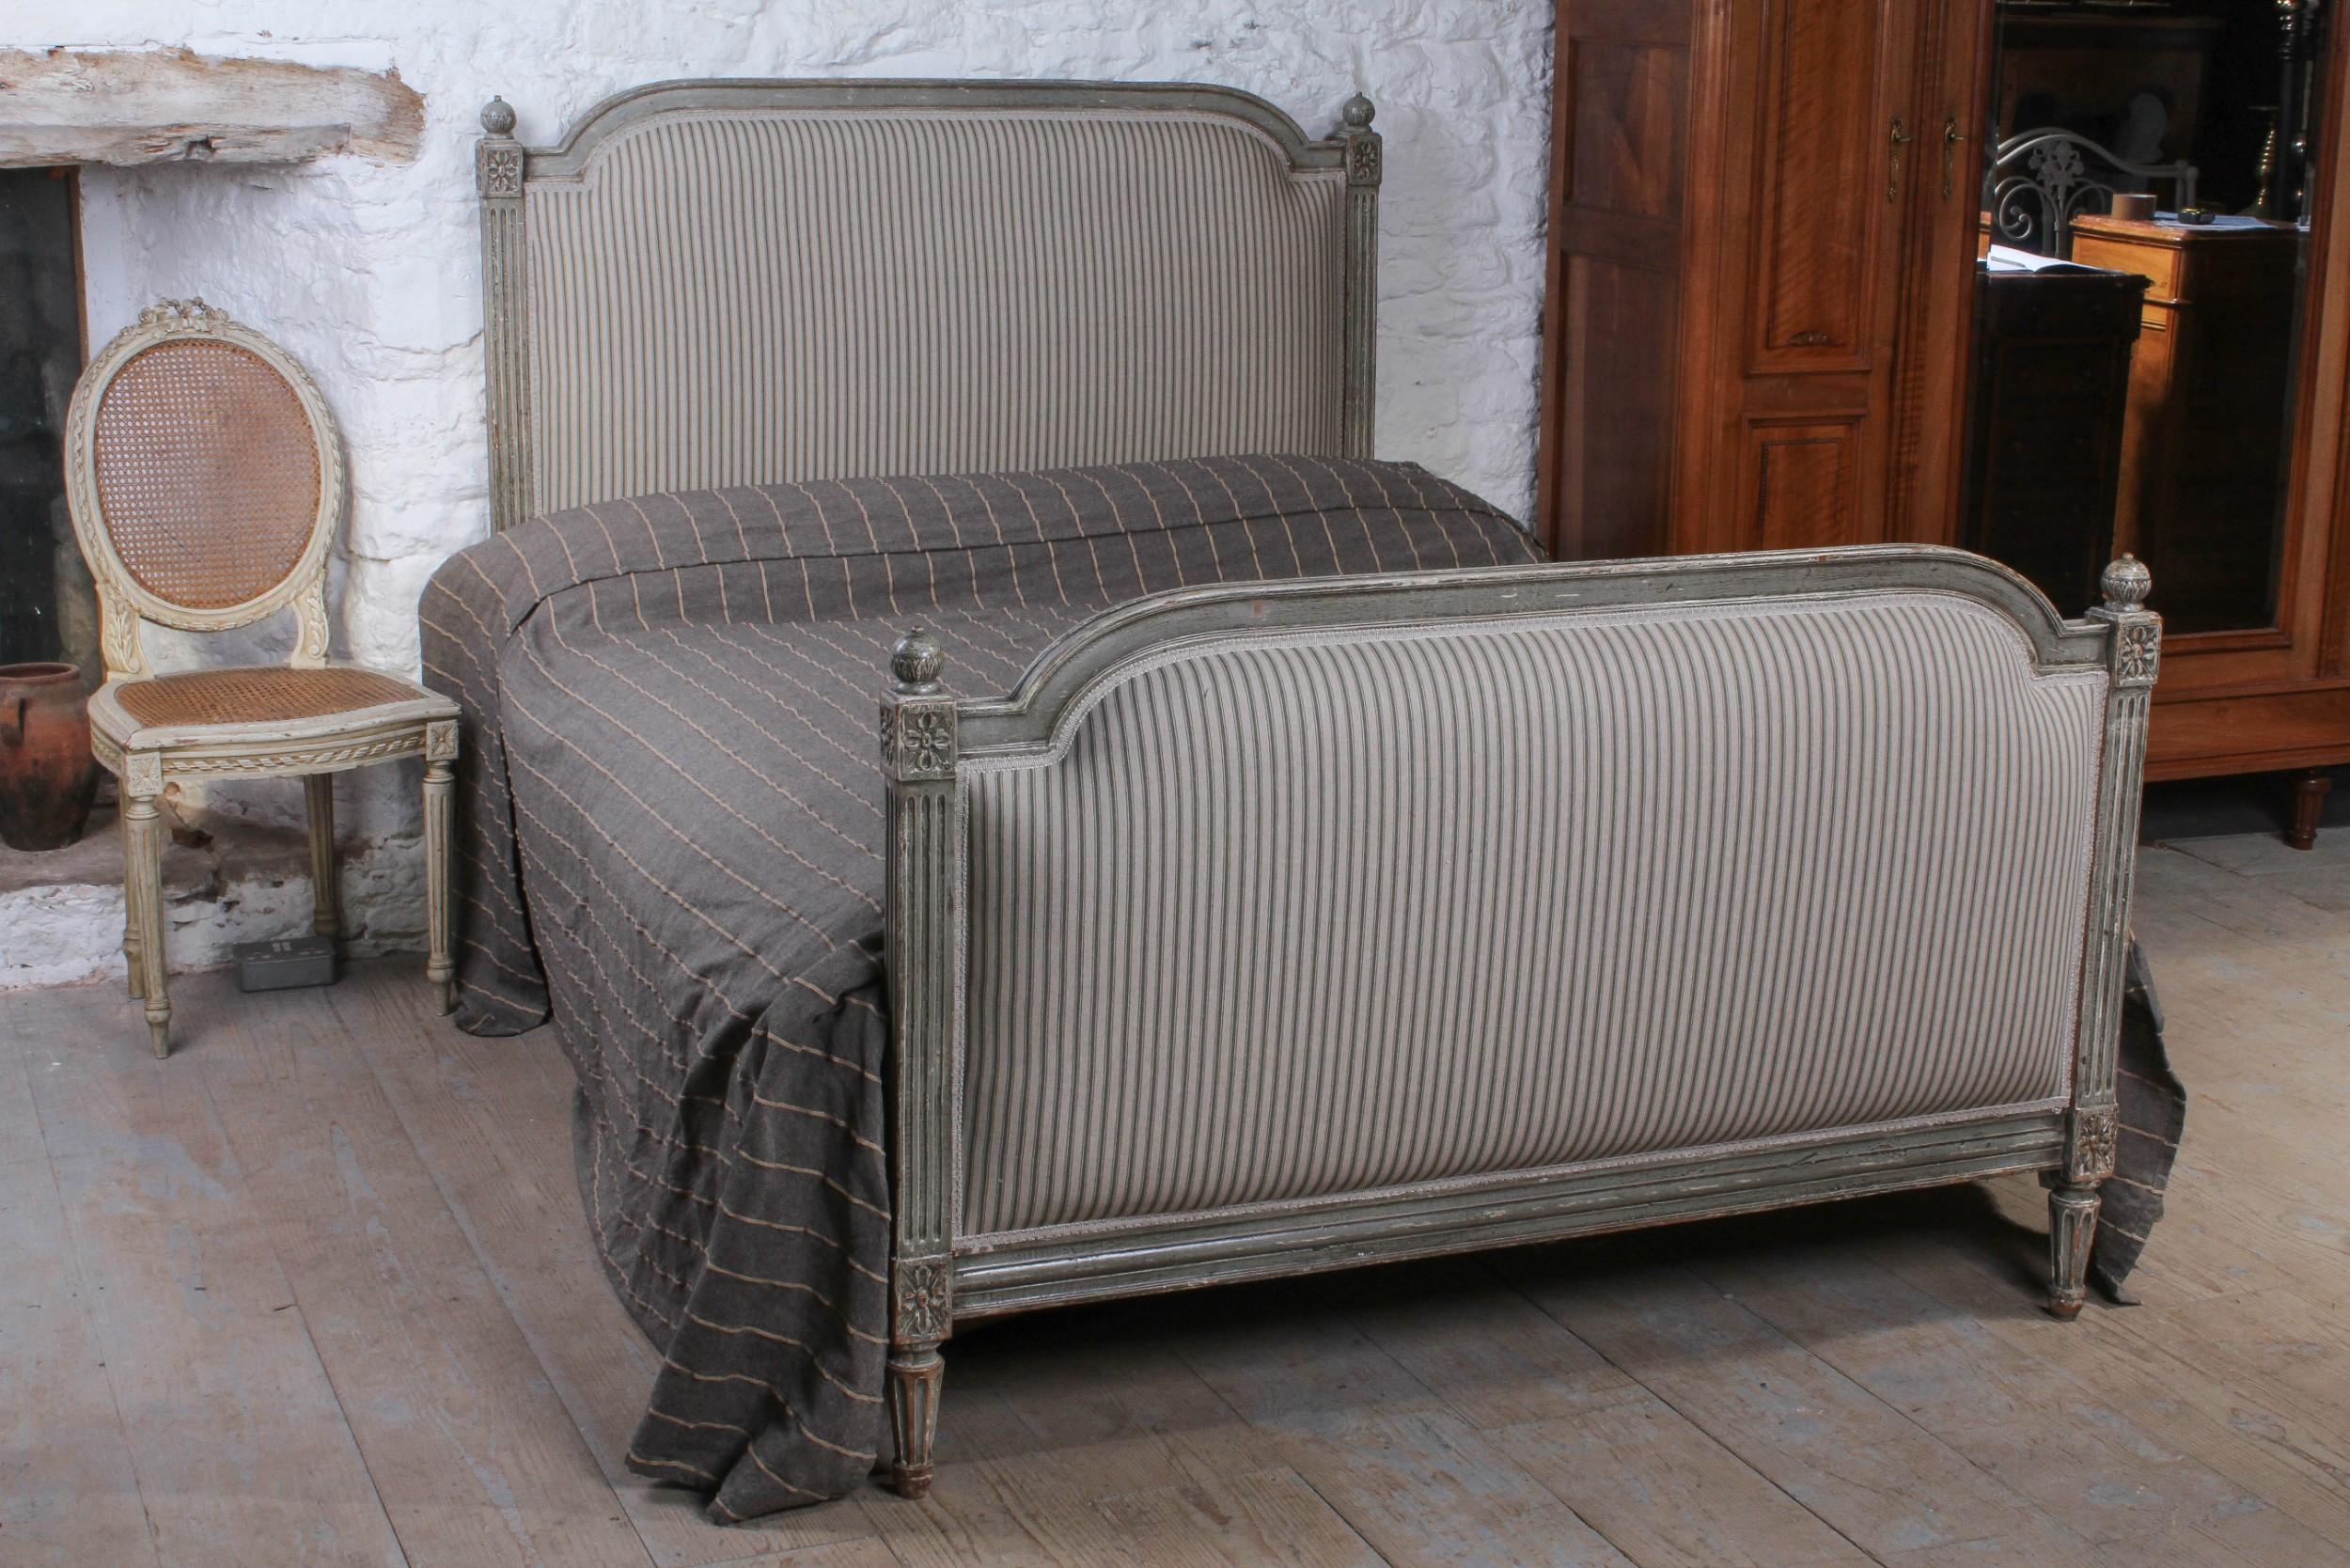 Gorgeous French Empire Style Upholstered Double Bed 603416 Sellingantiques Co Uk